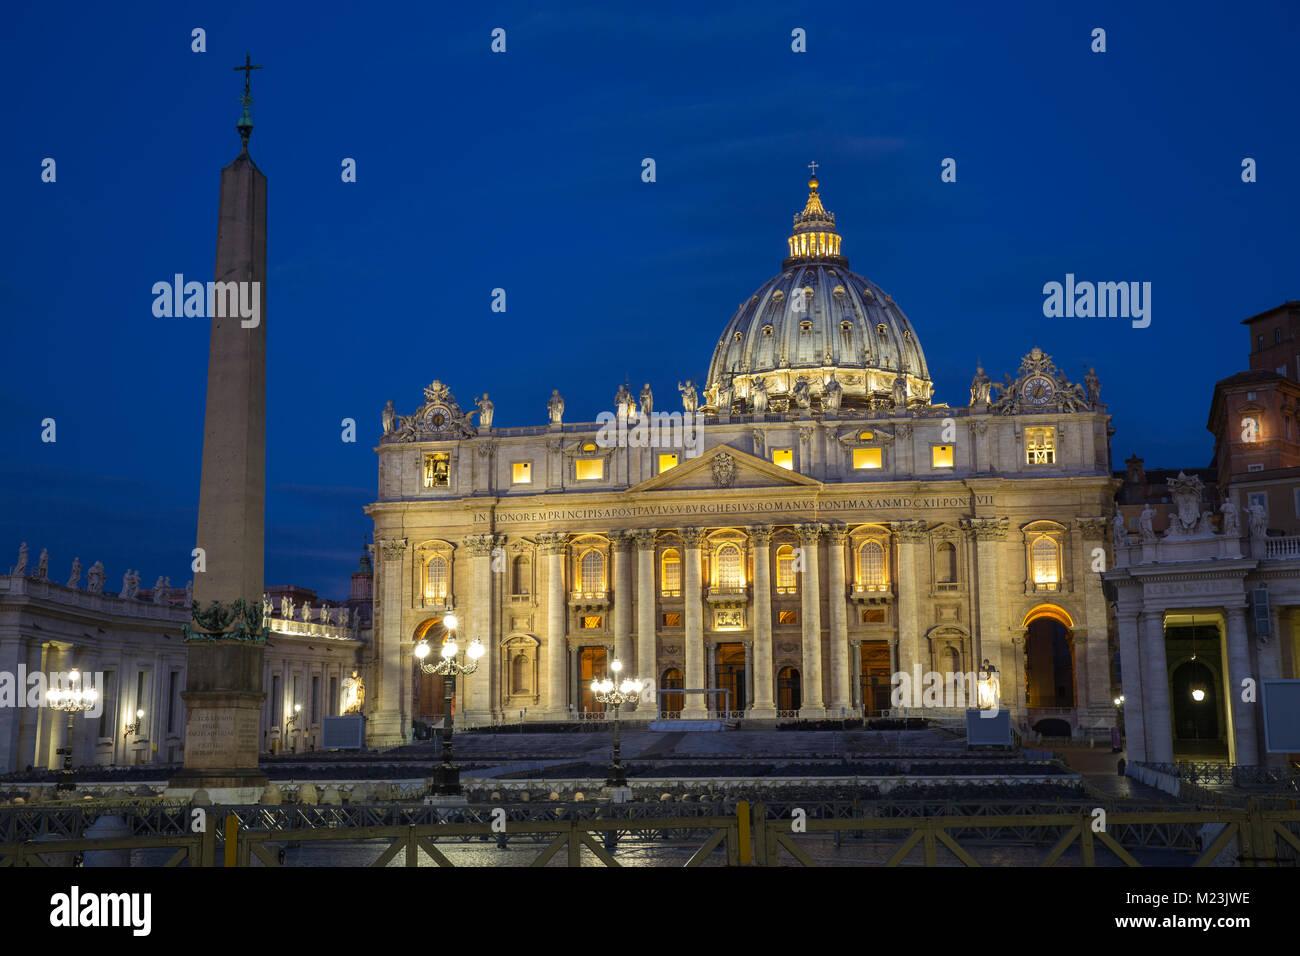 Vatican City, Rome, Italy - Stock Image